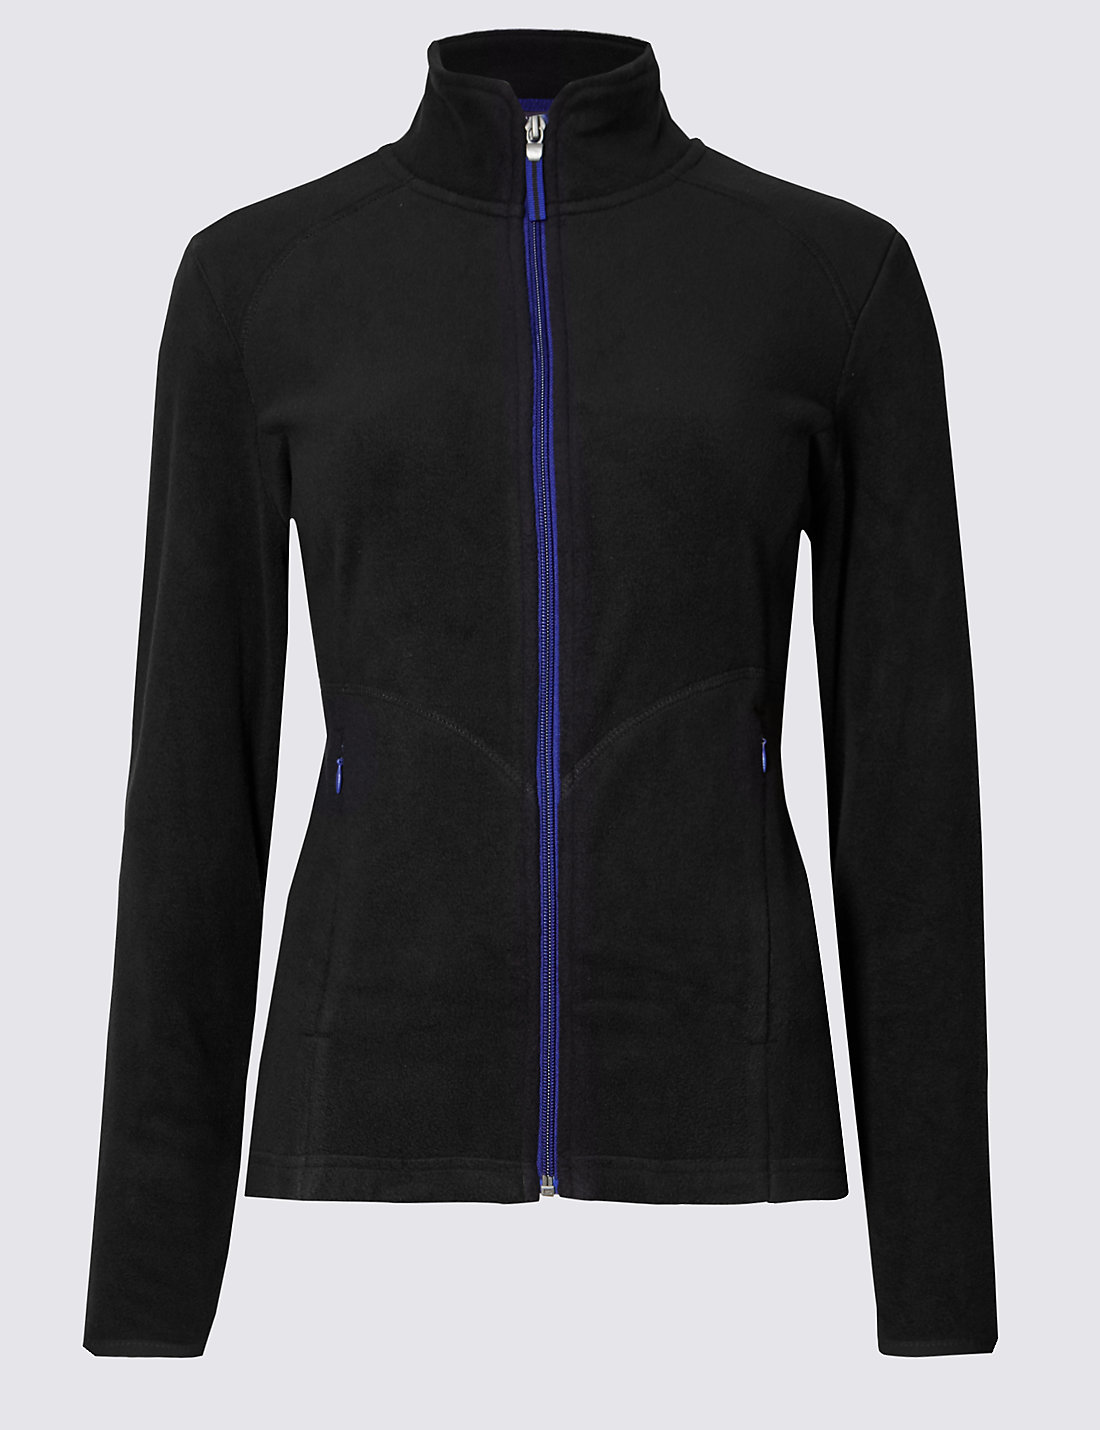 Womens Sports Jackets | Ladies Fleece & Running Jackets | M&S